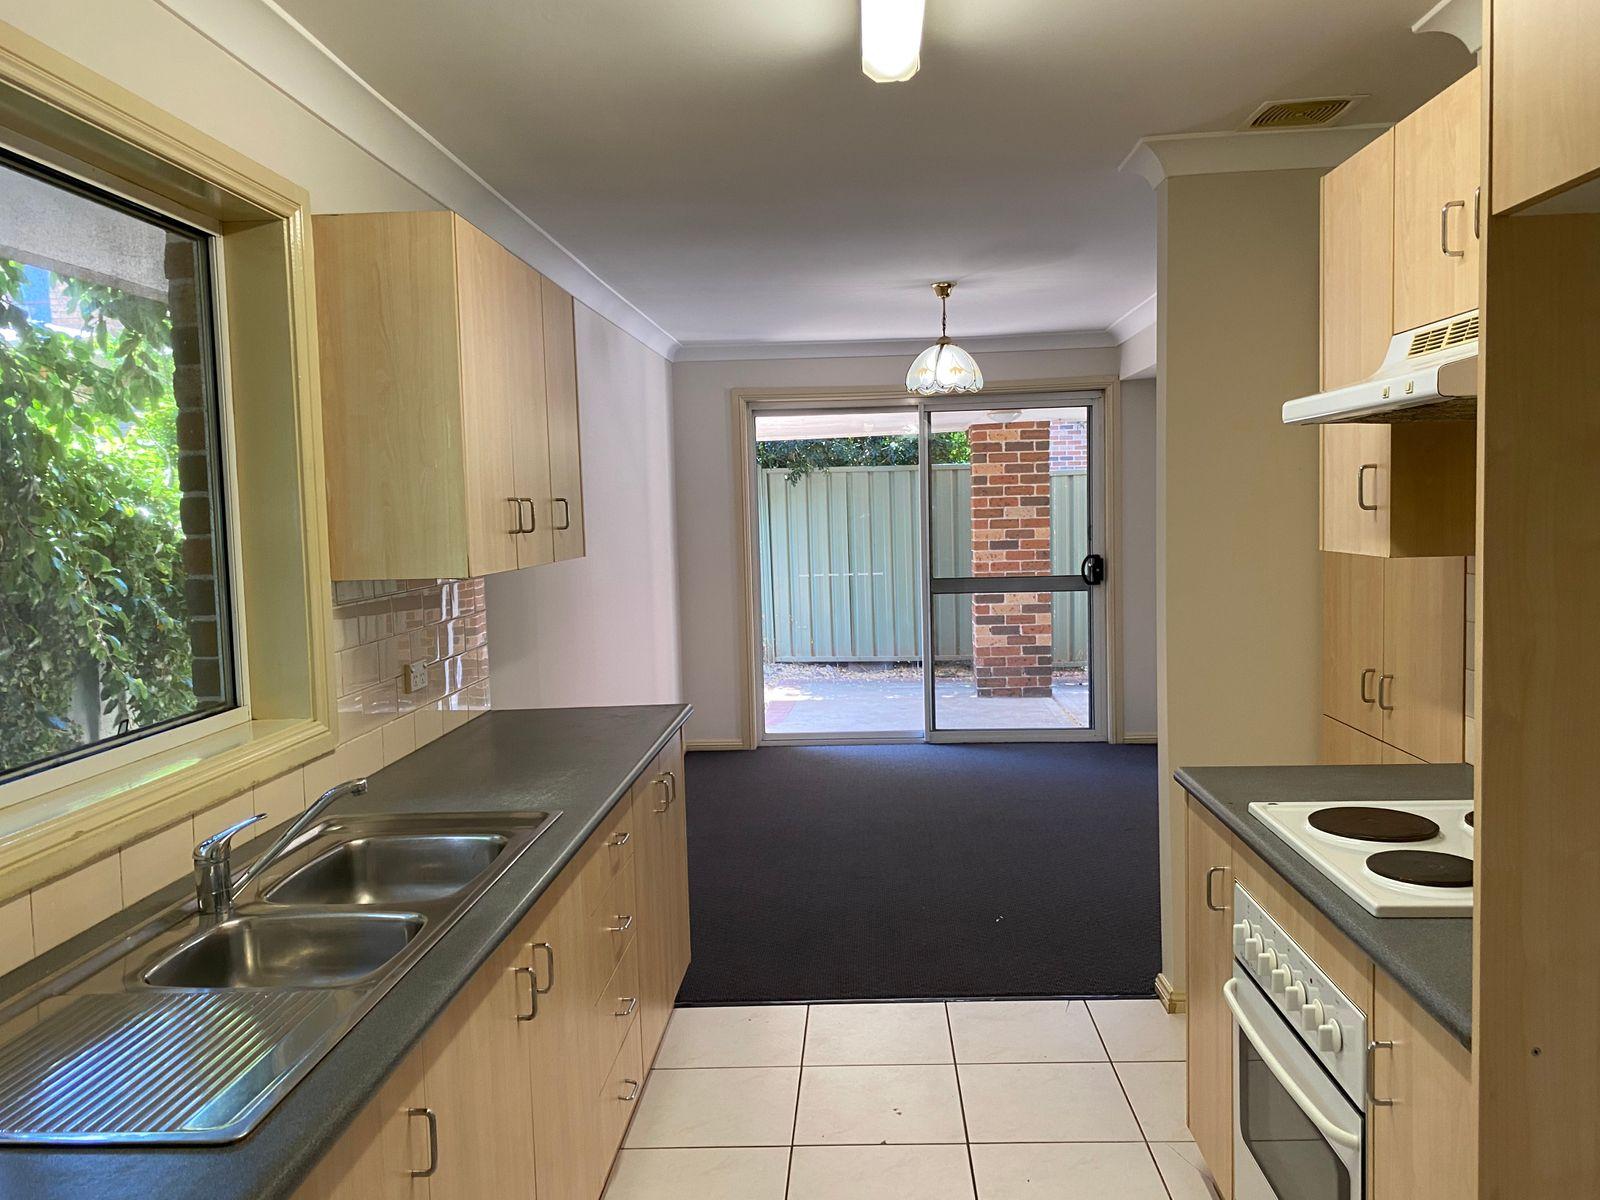 7/46-48 Lethbridge Street, Penrith, NSW 2750